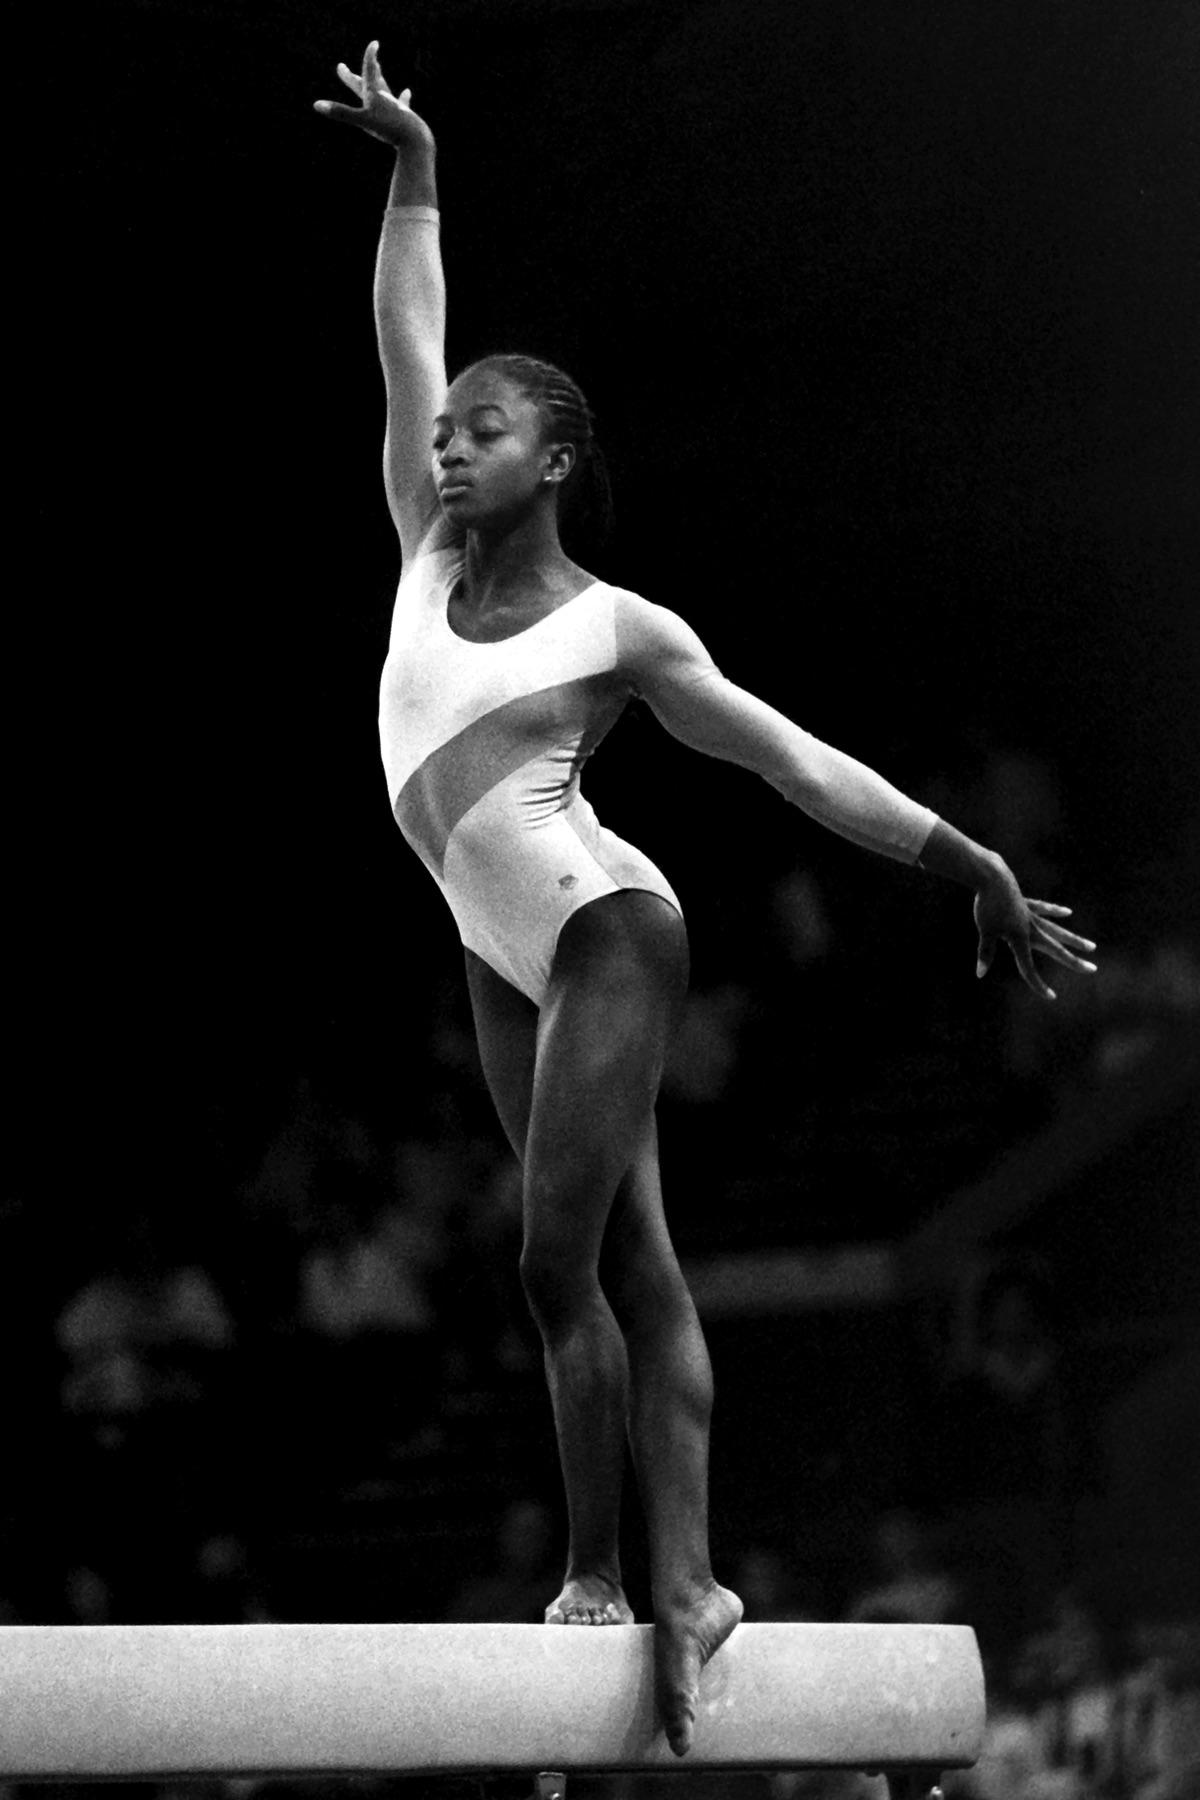 Kathy Williams competing on Balance Beam at the Royal Albert Hall